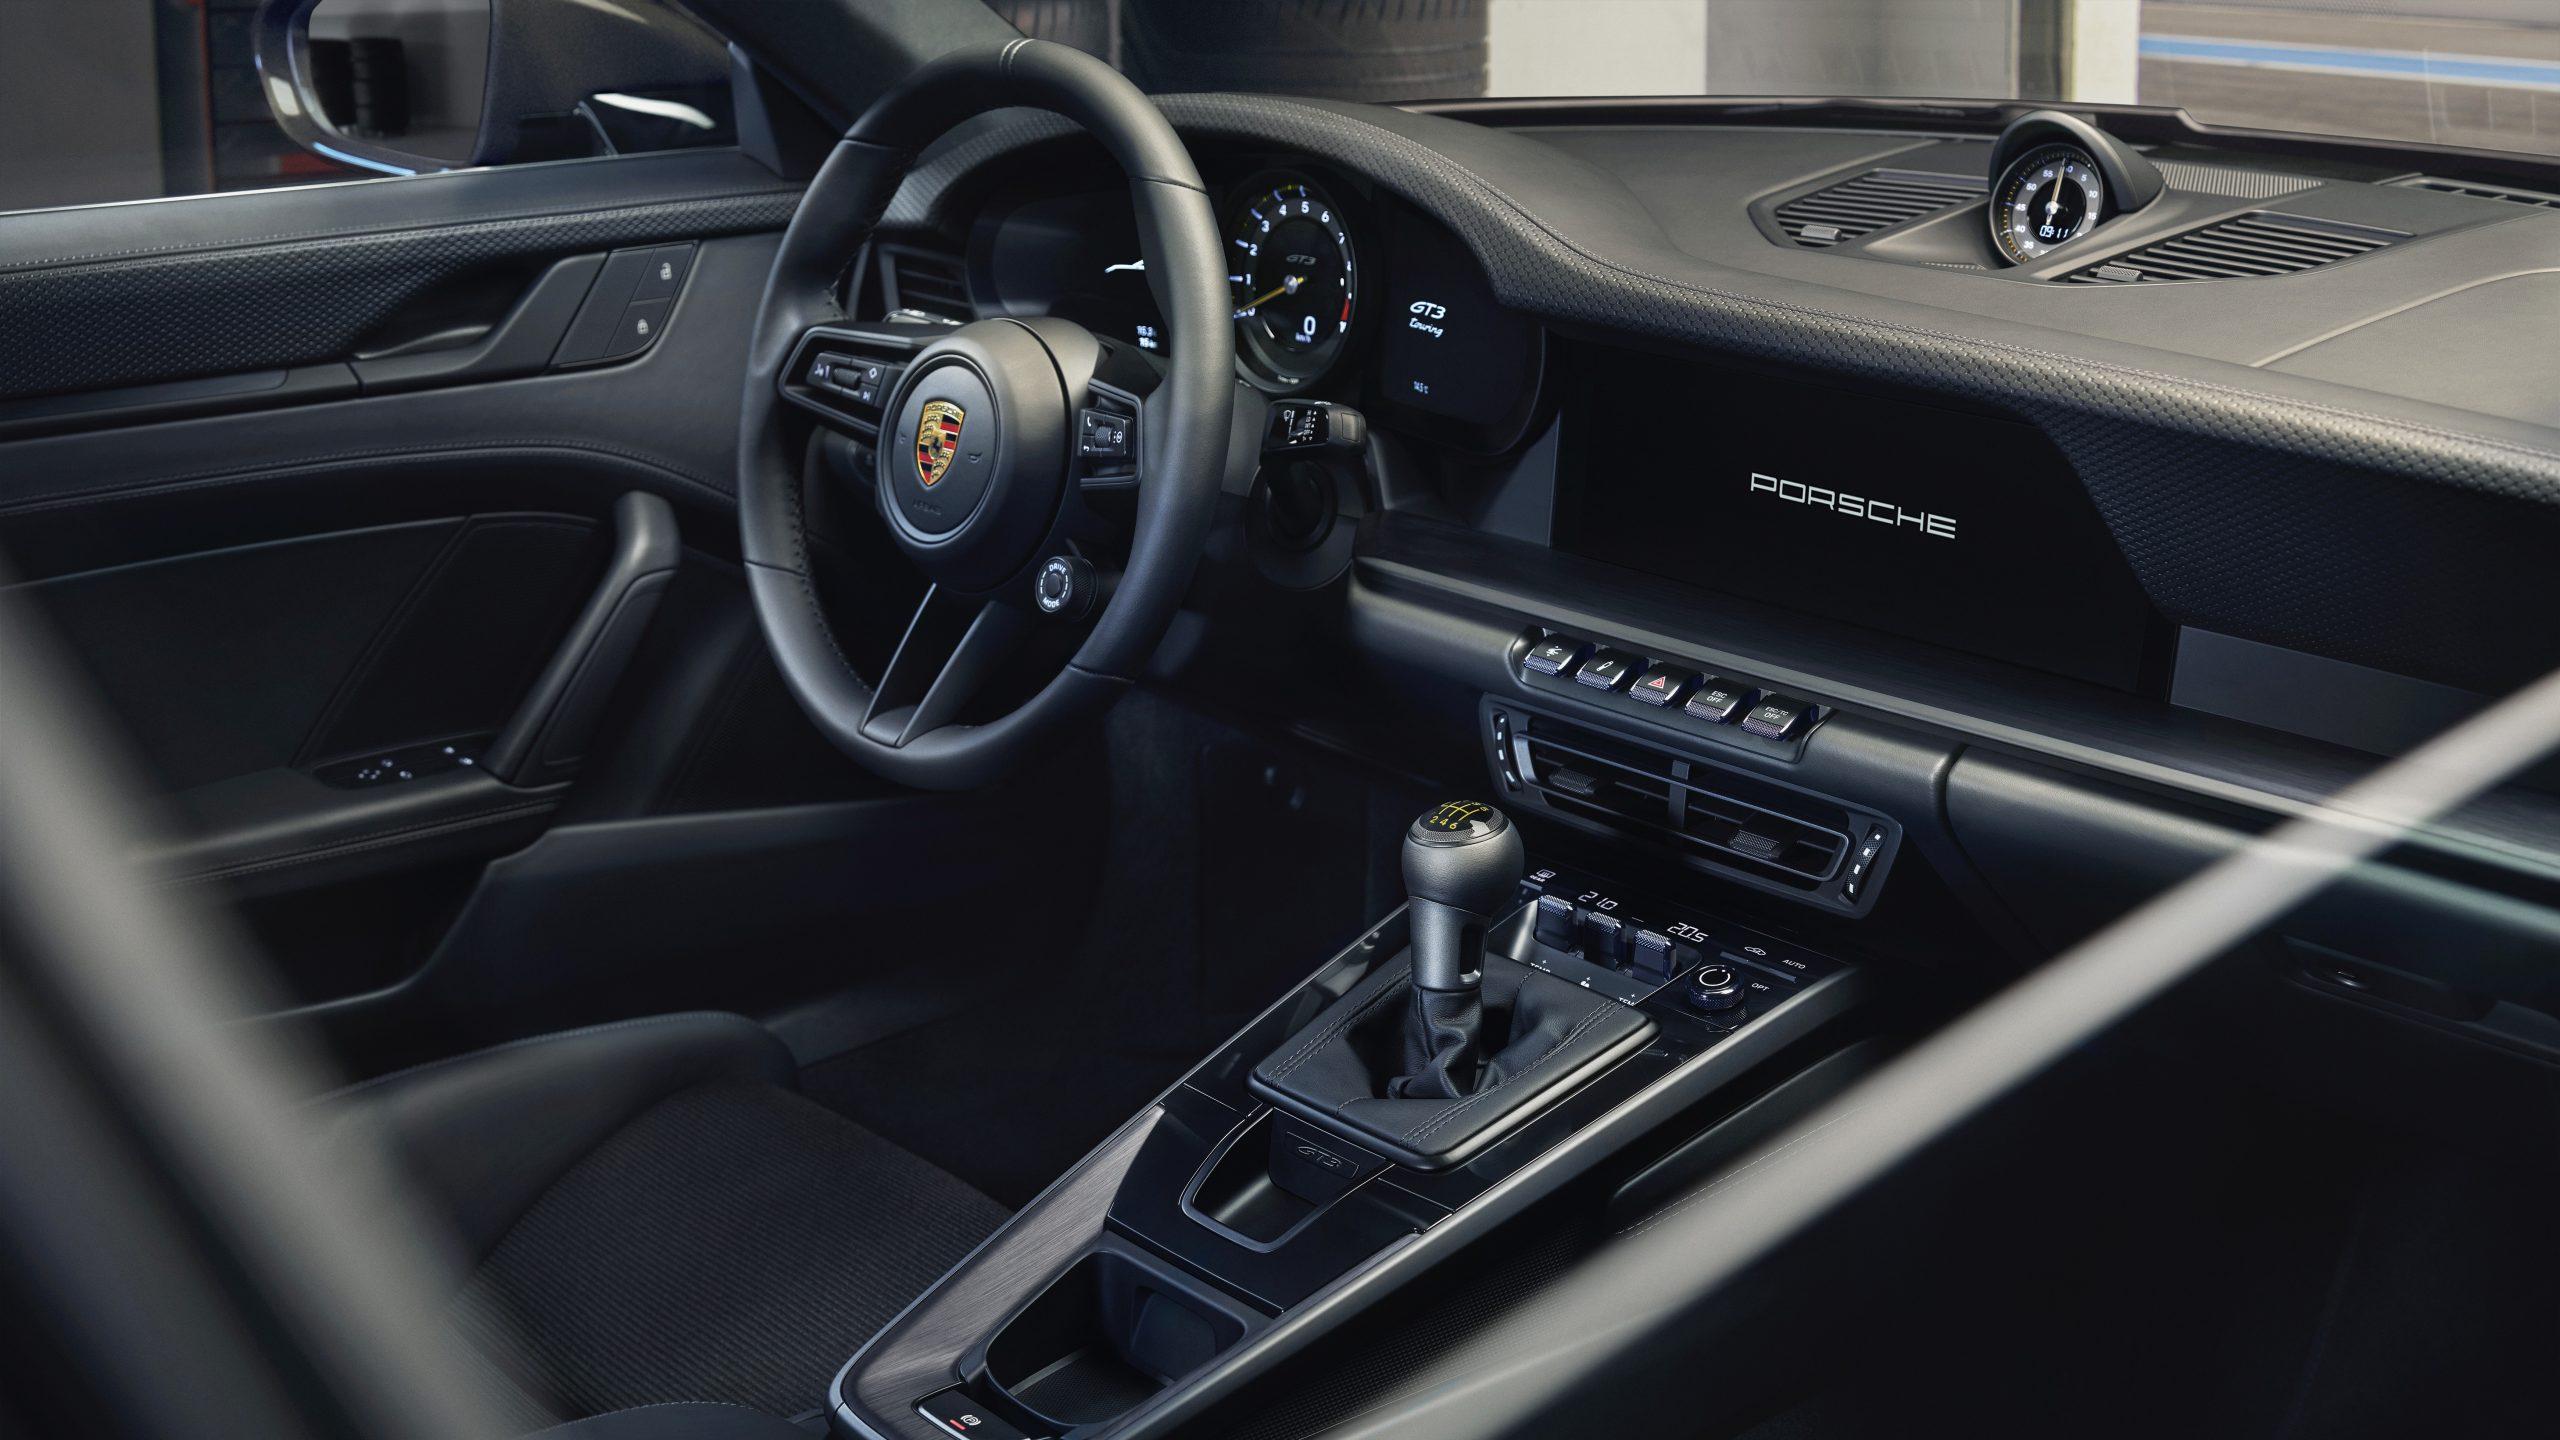 img 29 scaled Τι δίνει στην Porsche 992 GT3 Touring, τη δική της μοναδική γοητεία 911, 992, Porsche, Porsche 911, Porsche 911 GT3, sportscar, zblog, ειδήσεις, Νέα